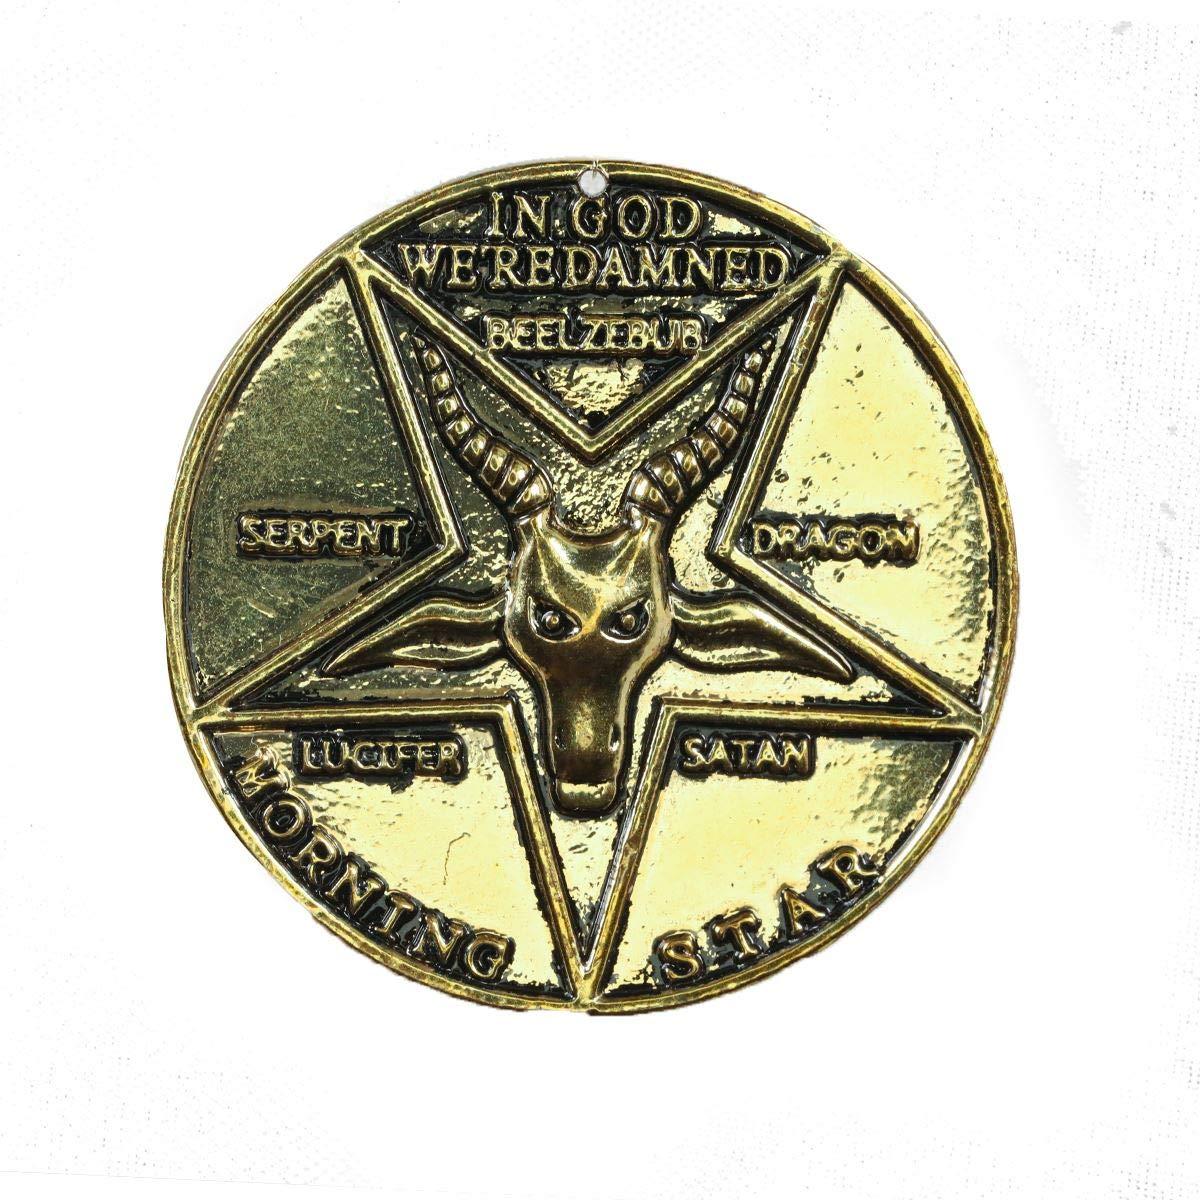 LIGONG 2Pcs Satan Coins Lucifer Pentecostal Coin Cosplay Accessories Movie Costume Prop